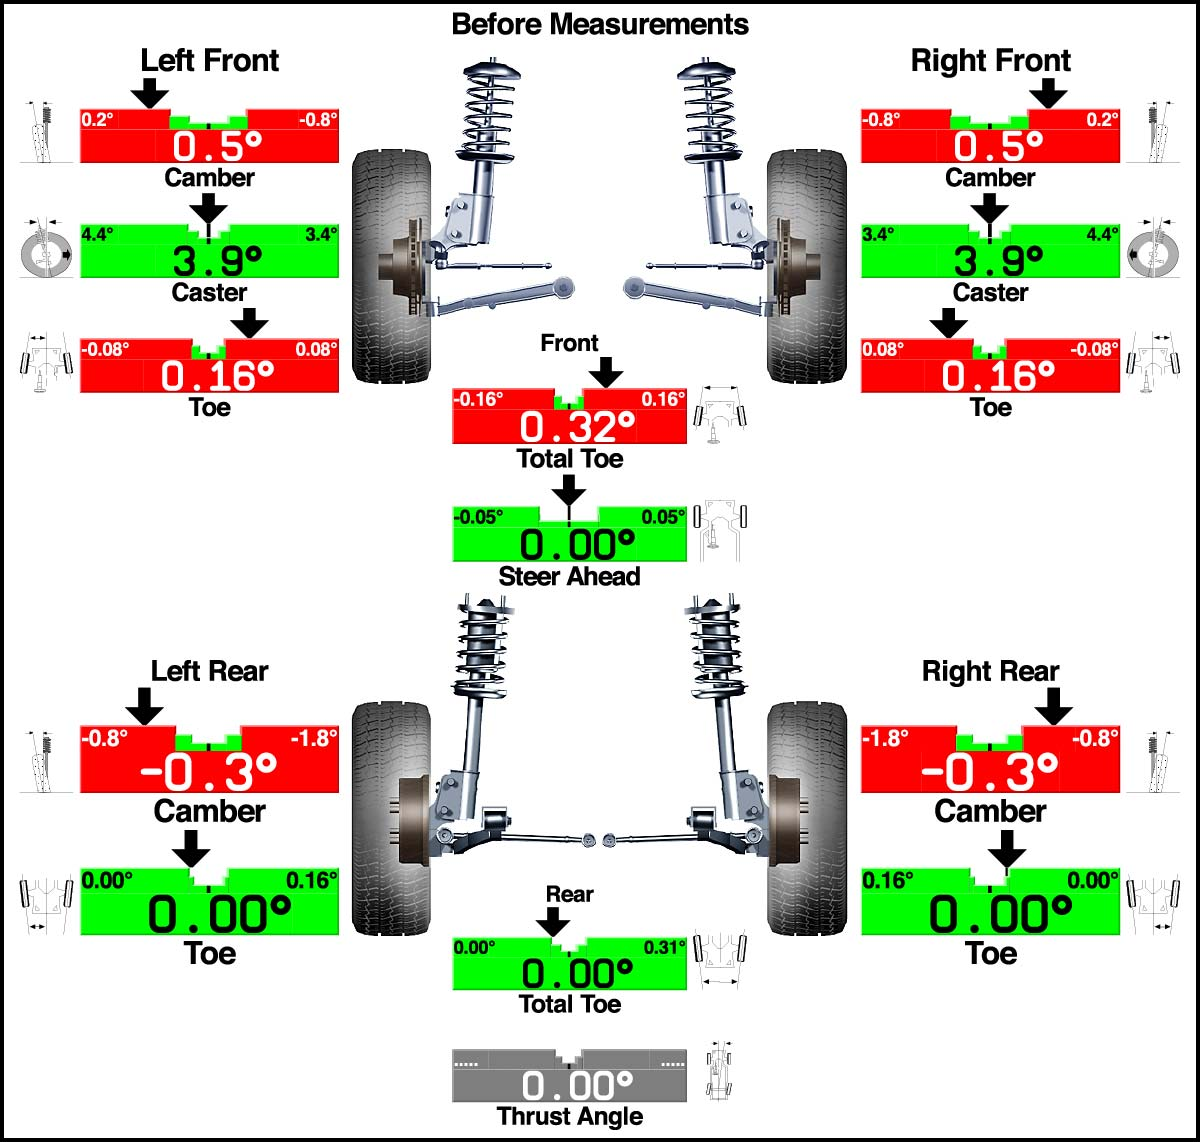 printout of measurements before alignment